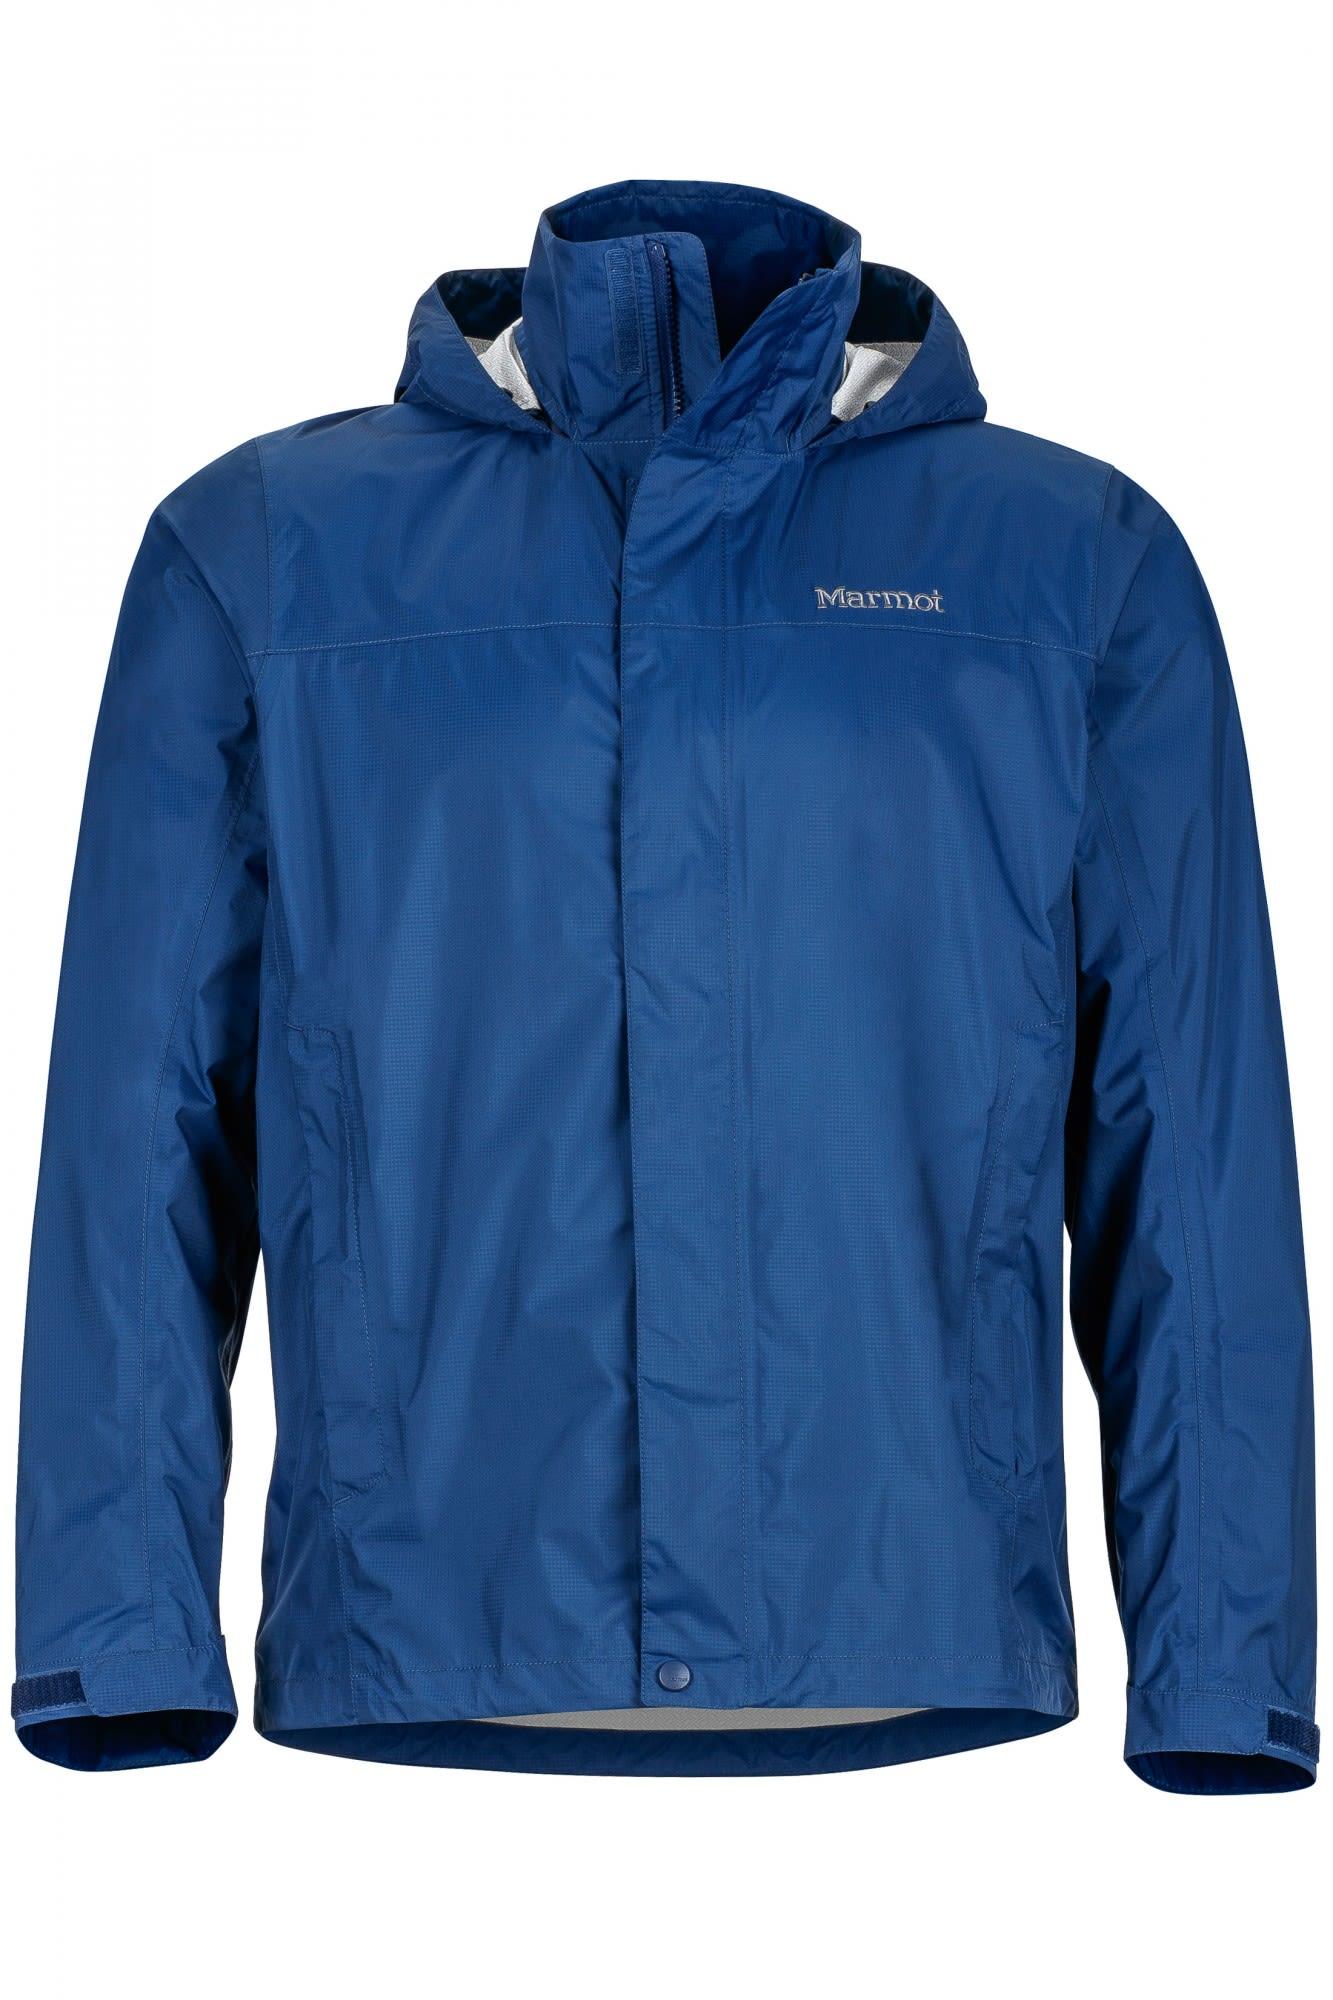 Marmot Precip Jacket Blau, Male Freizeitjacke, L